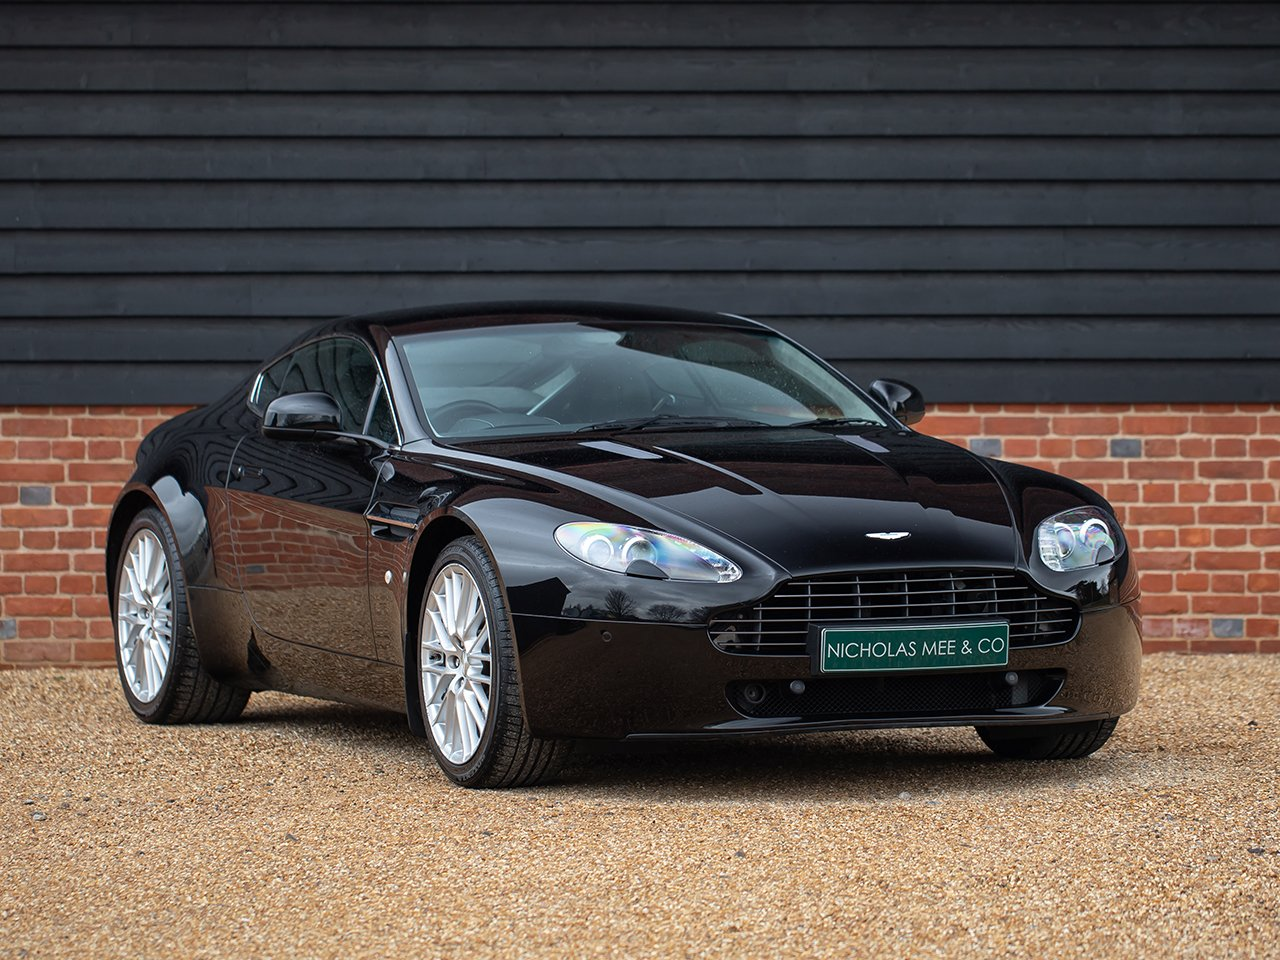 2010 Aston Martin V8 Vantage Classic Driver Market